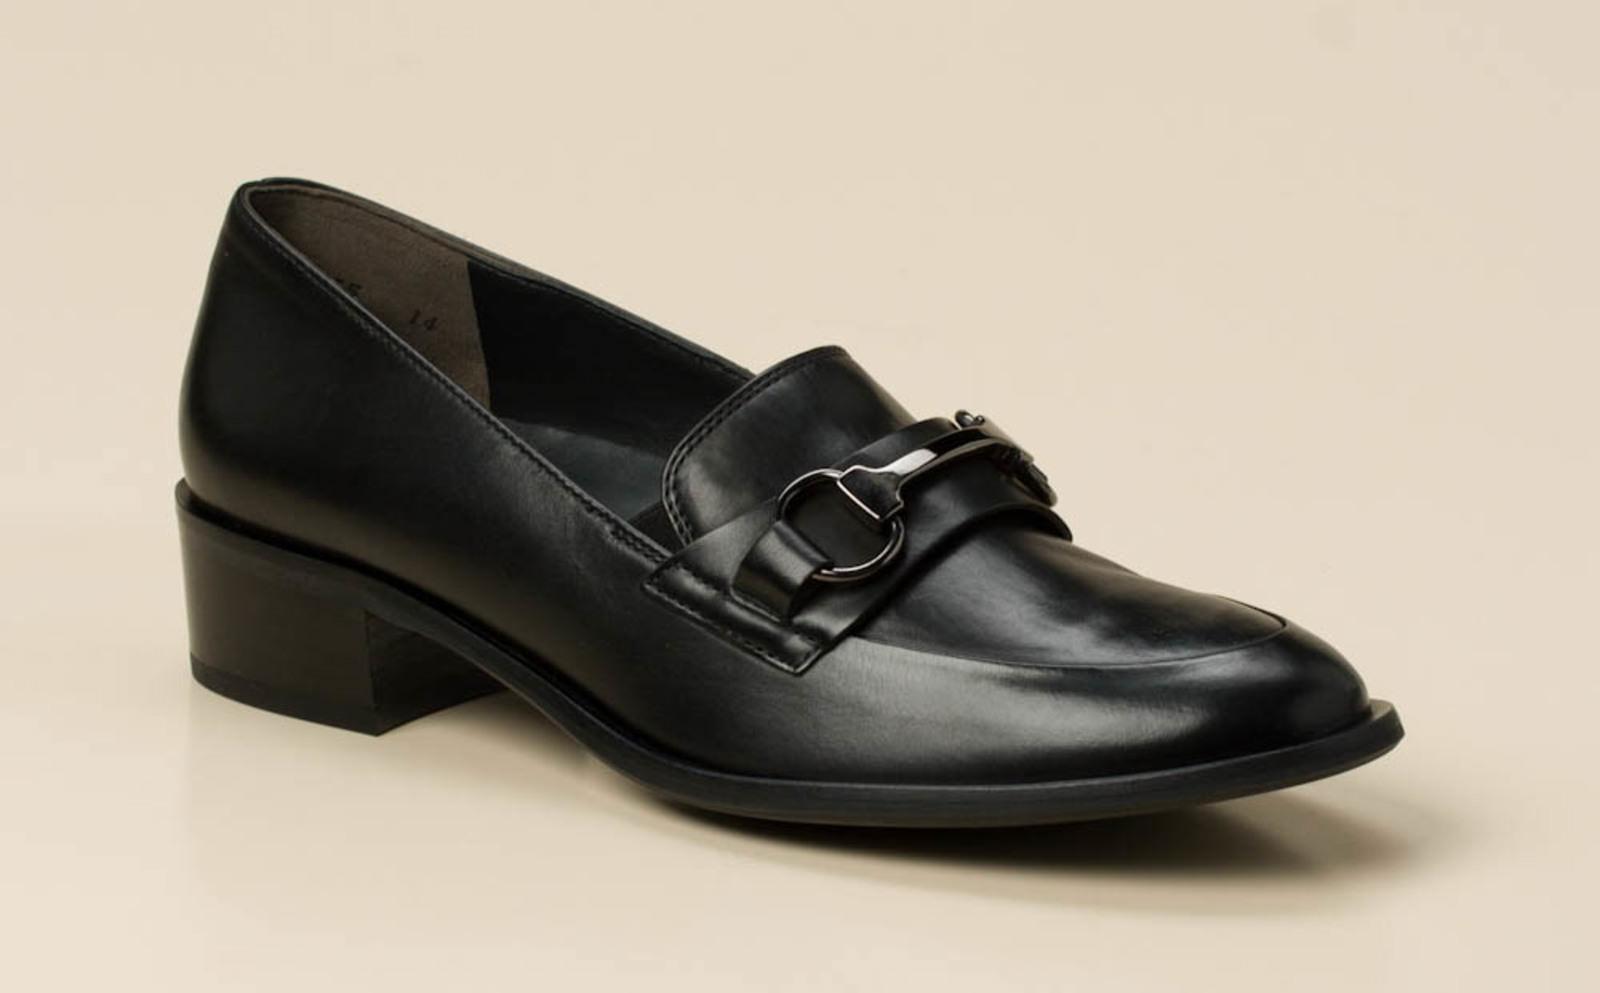 paul green damen loafer in schwarz kaufen zumnorde online shop. Black Bedroom Furniture Sets. Home Design Ideas